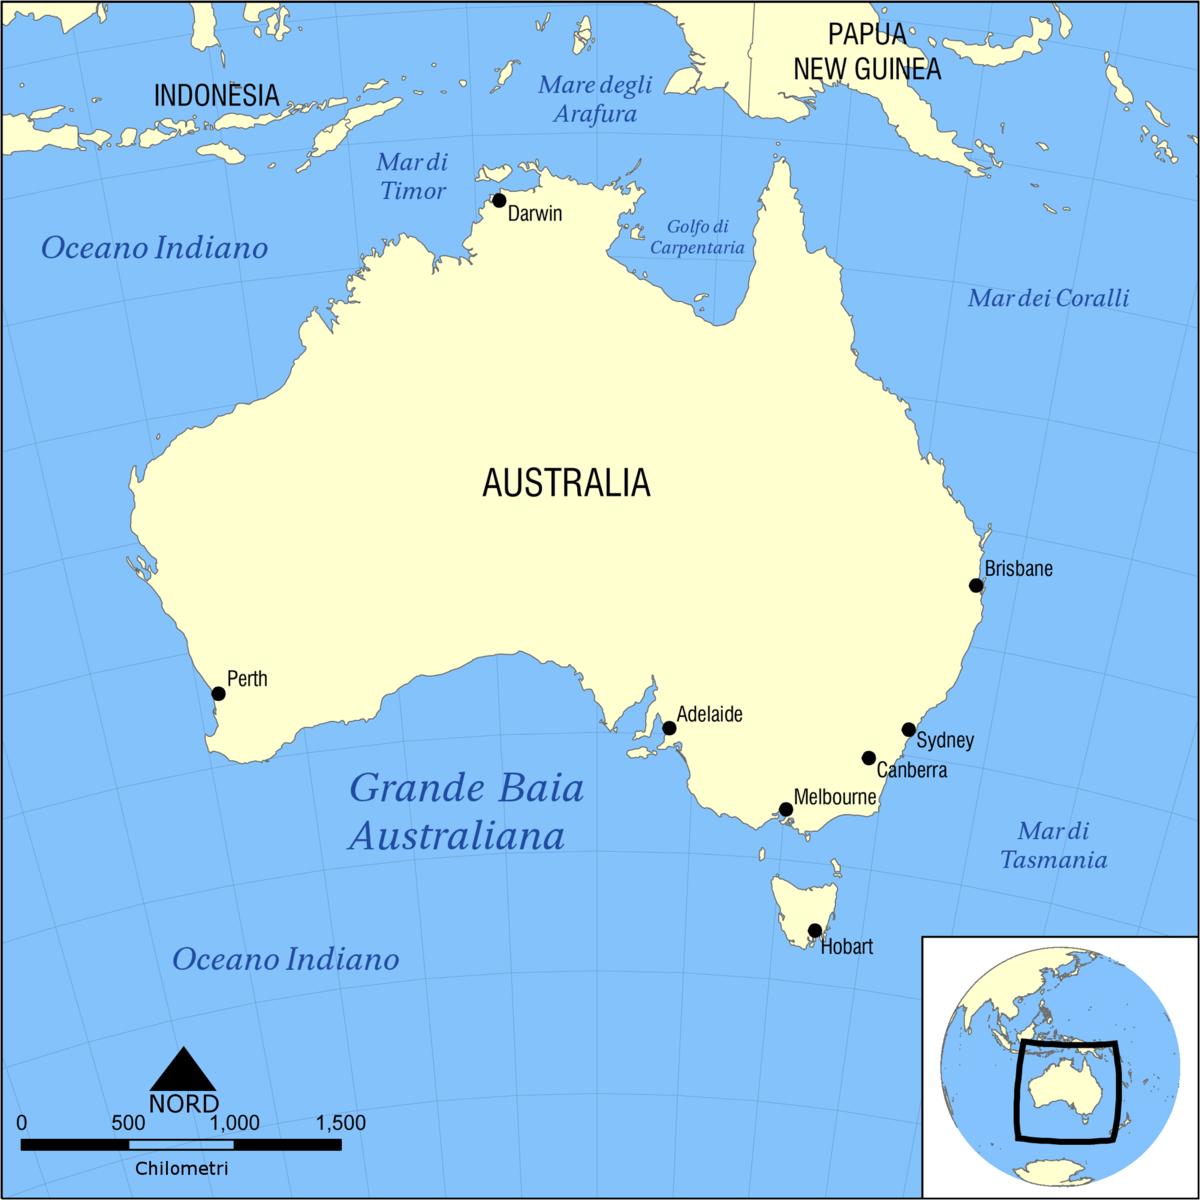 grande baia australiana